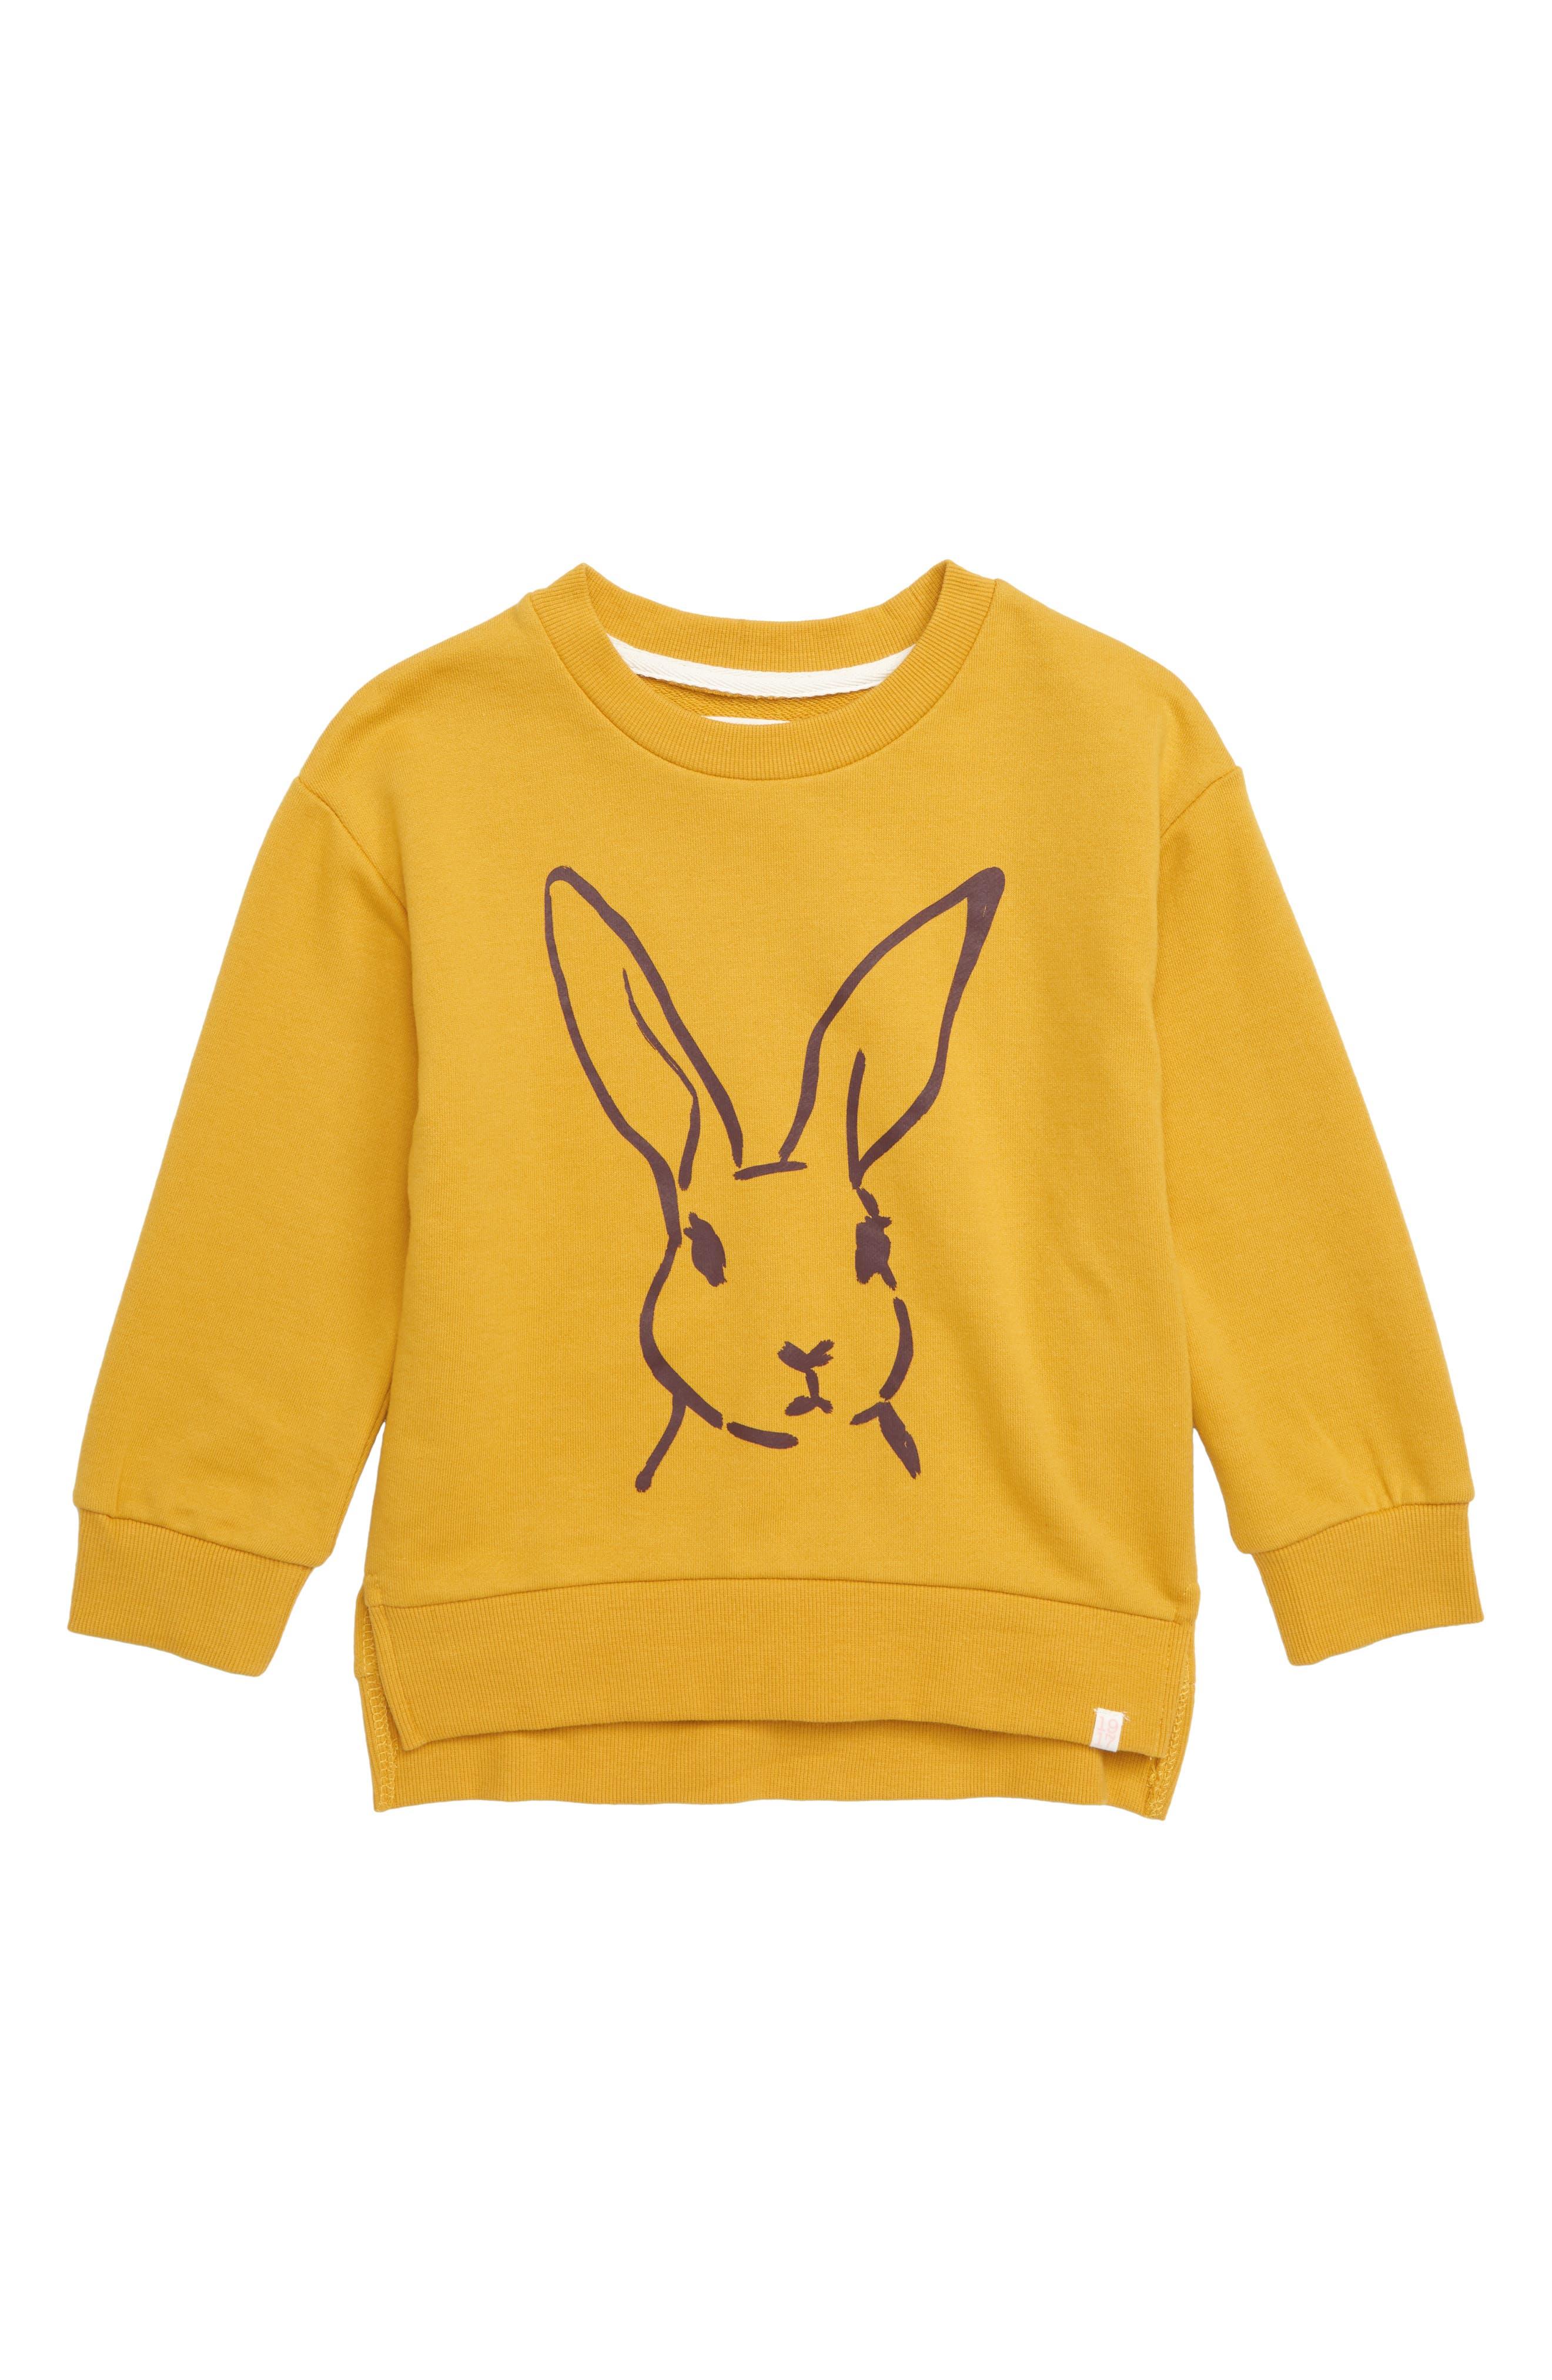 SOVEREIGN CODE,                             Kennedy Bunny Graphic Sweatshirt,                             Main thumbnail 1, color,                             BUNNY/ MARIGOLD